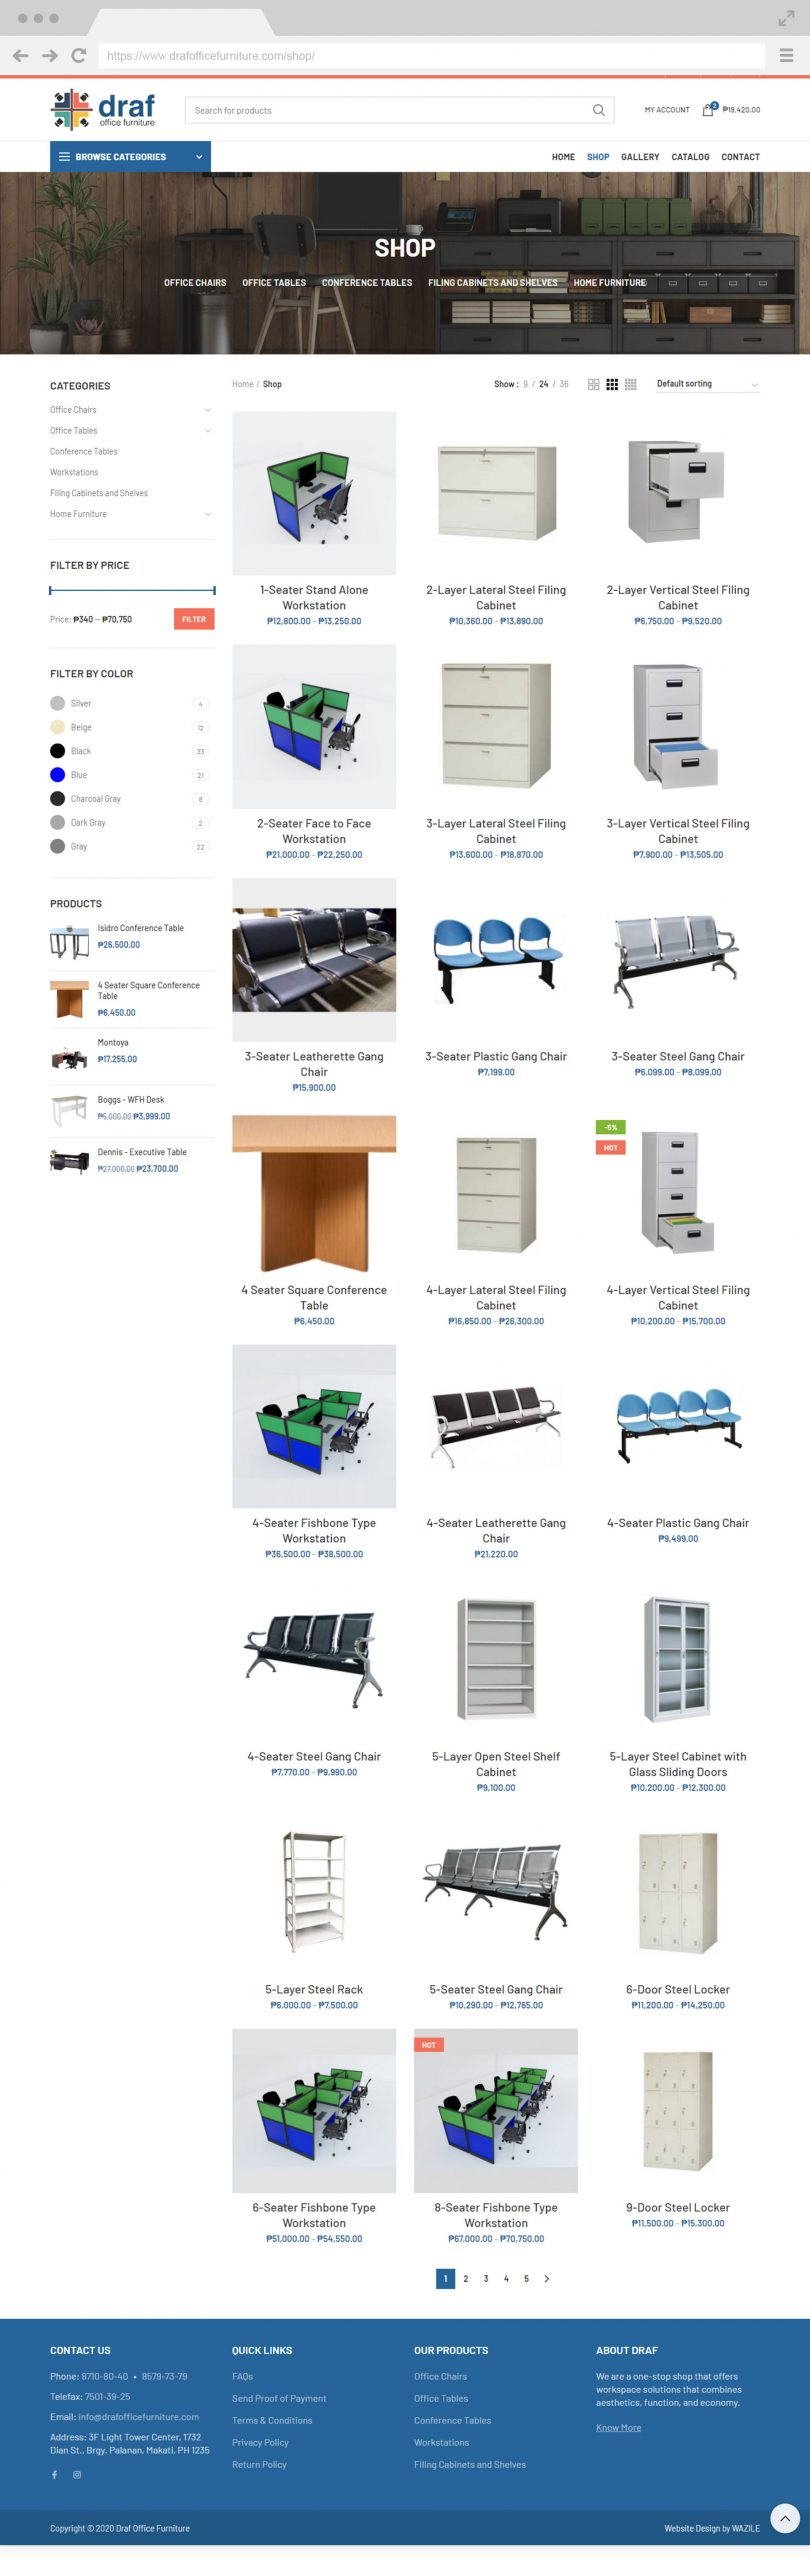 Draf Office Furniture Portfolio